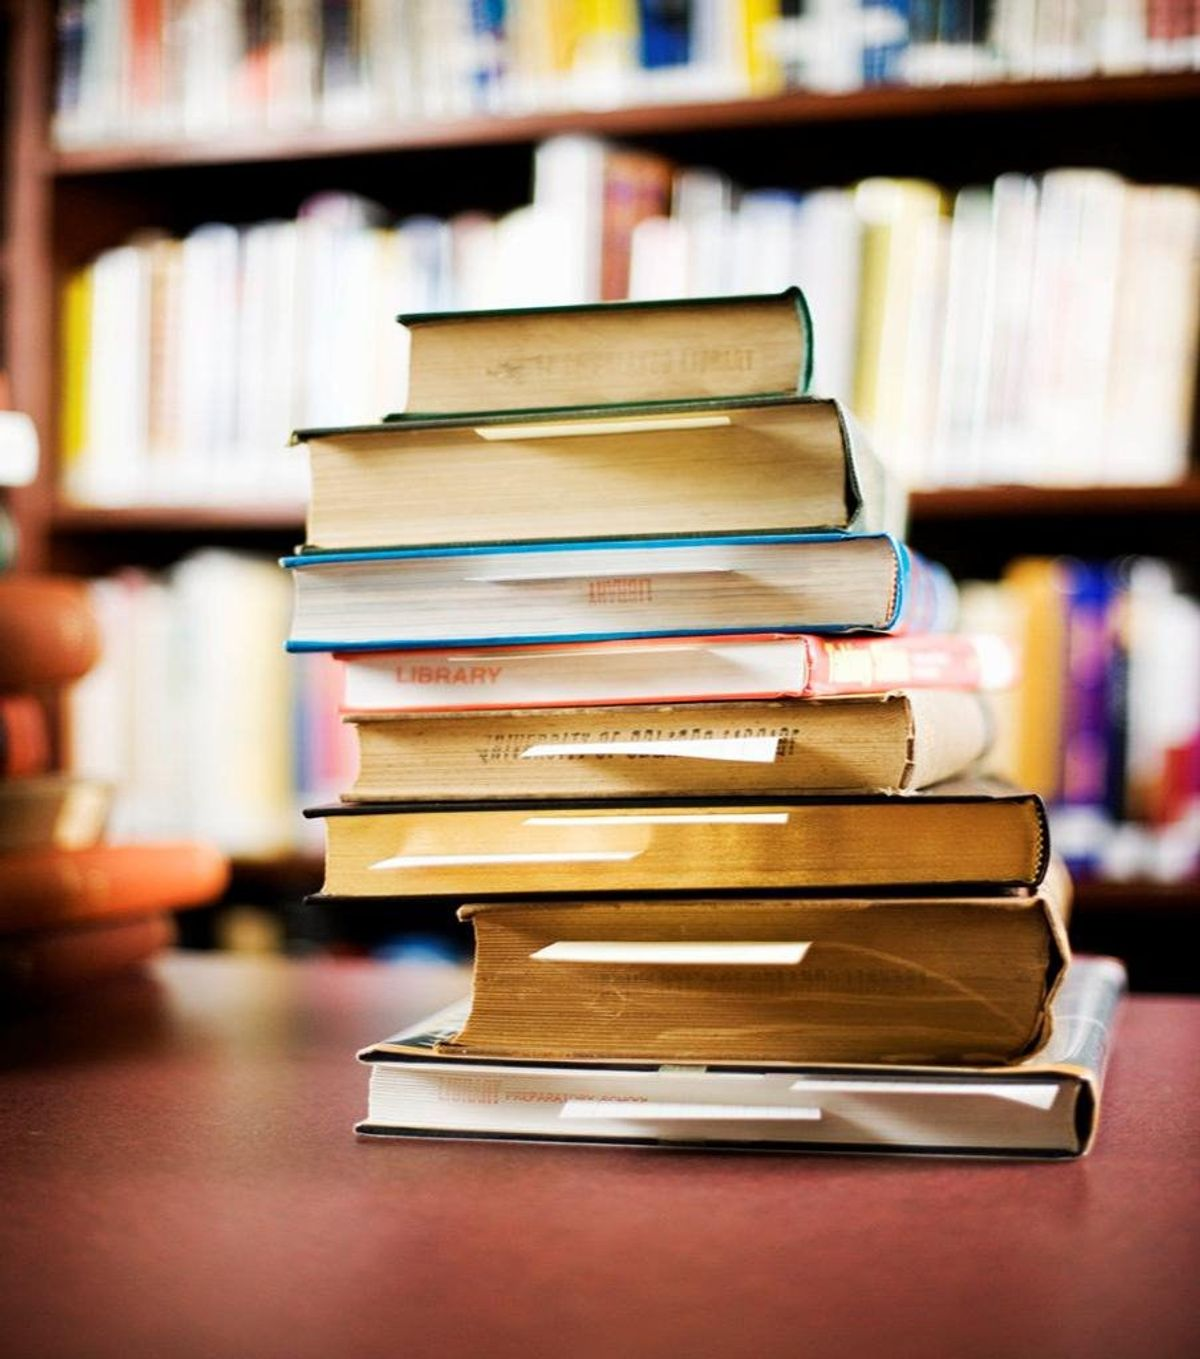 10 Study Tips For College Freshmen